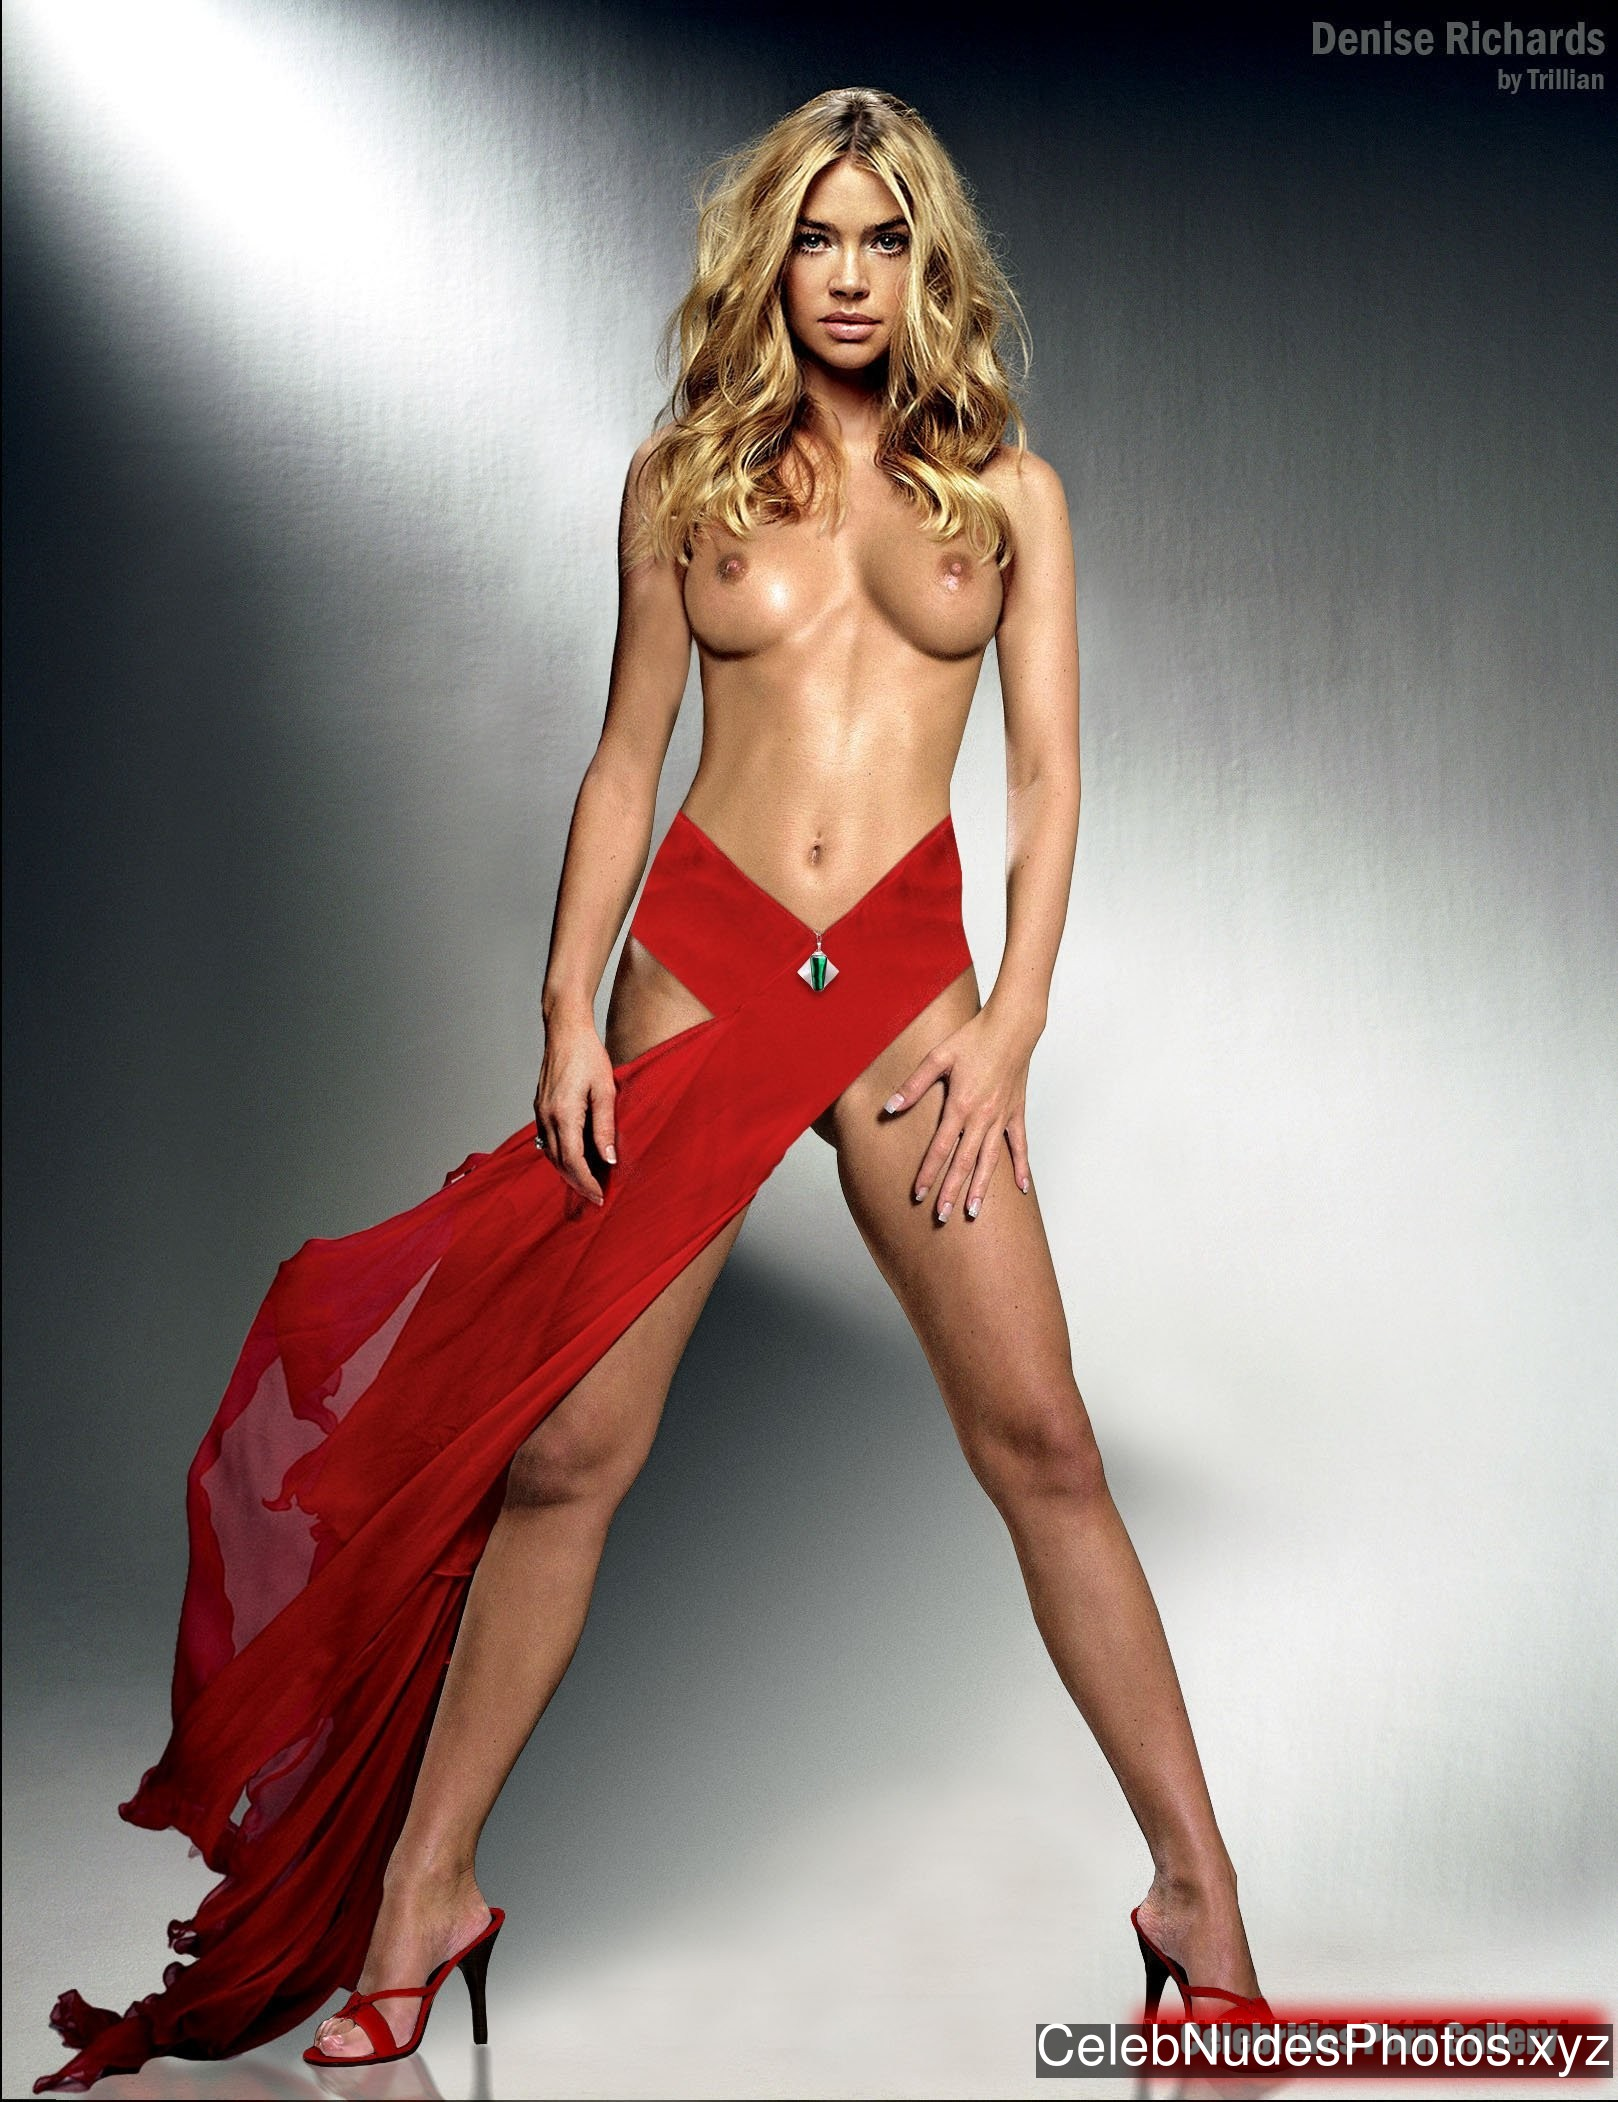 Denise Richards Celebrities Naked sexy 24